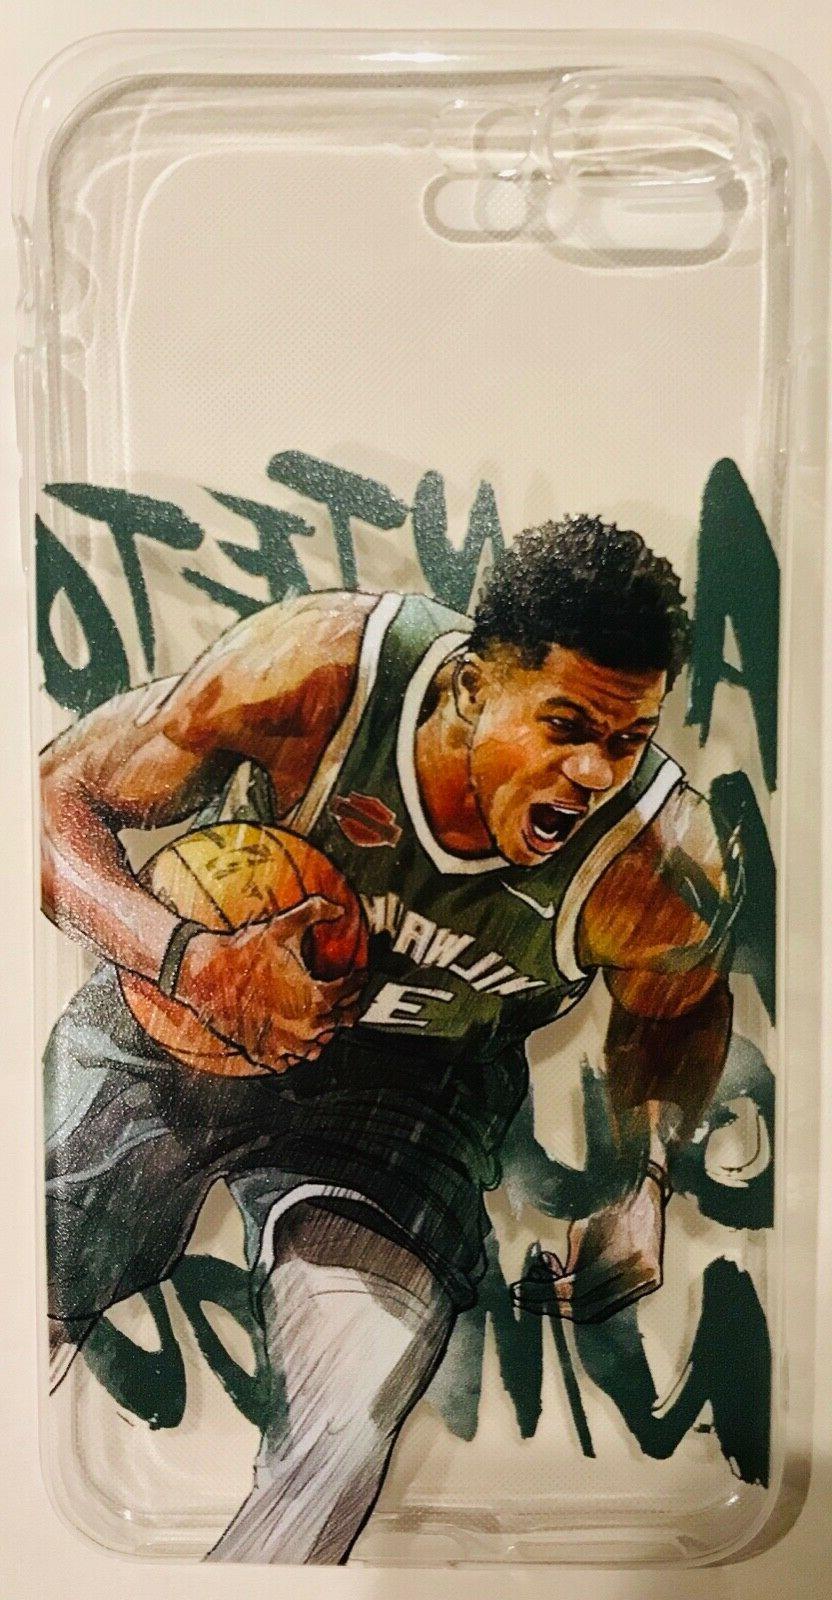 Giannis Milwaukee iPhone Phone Cover